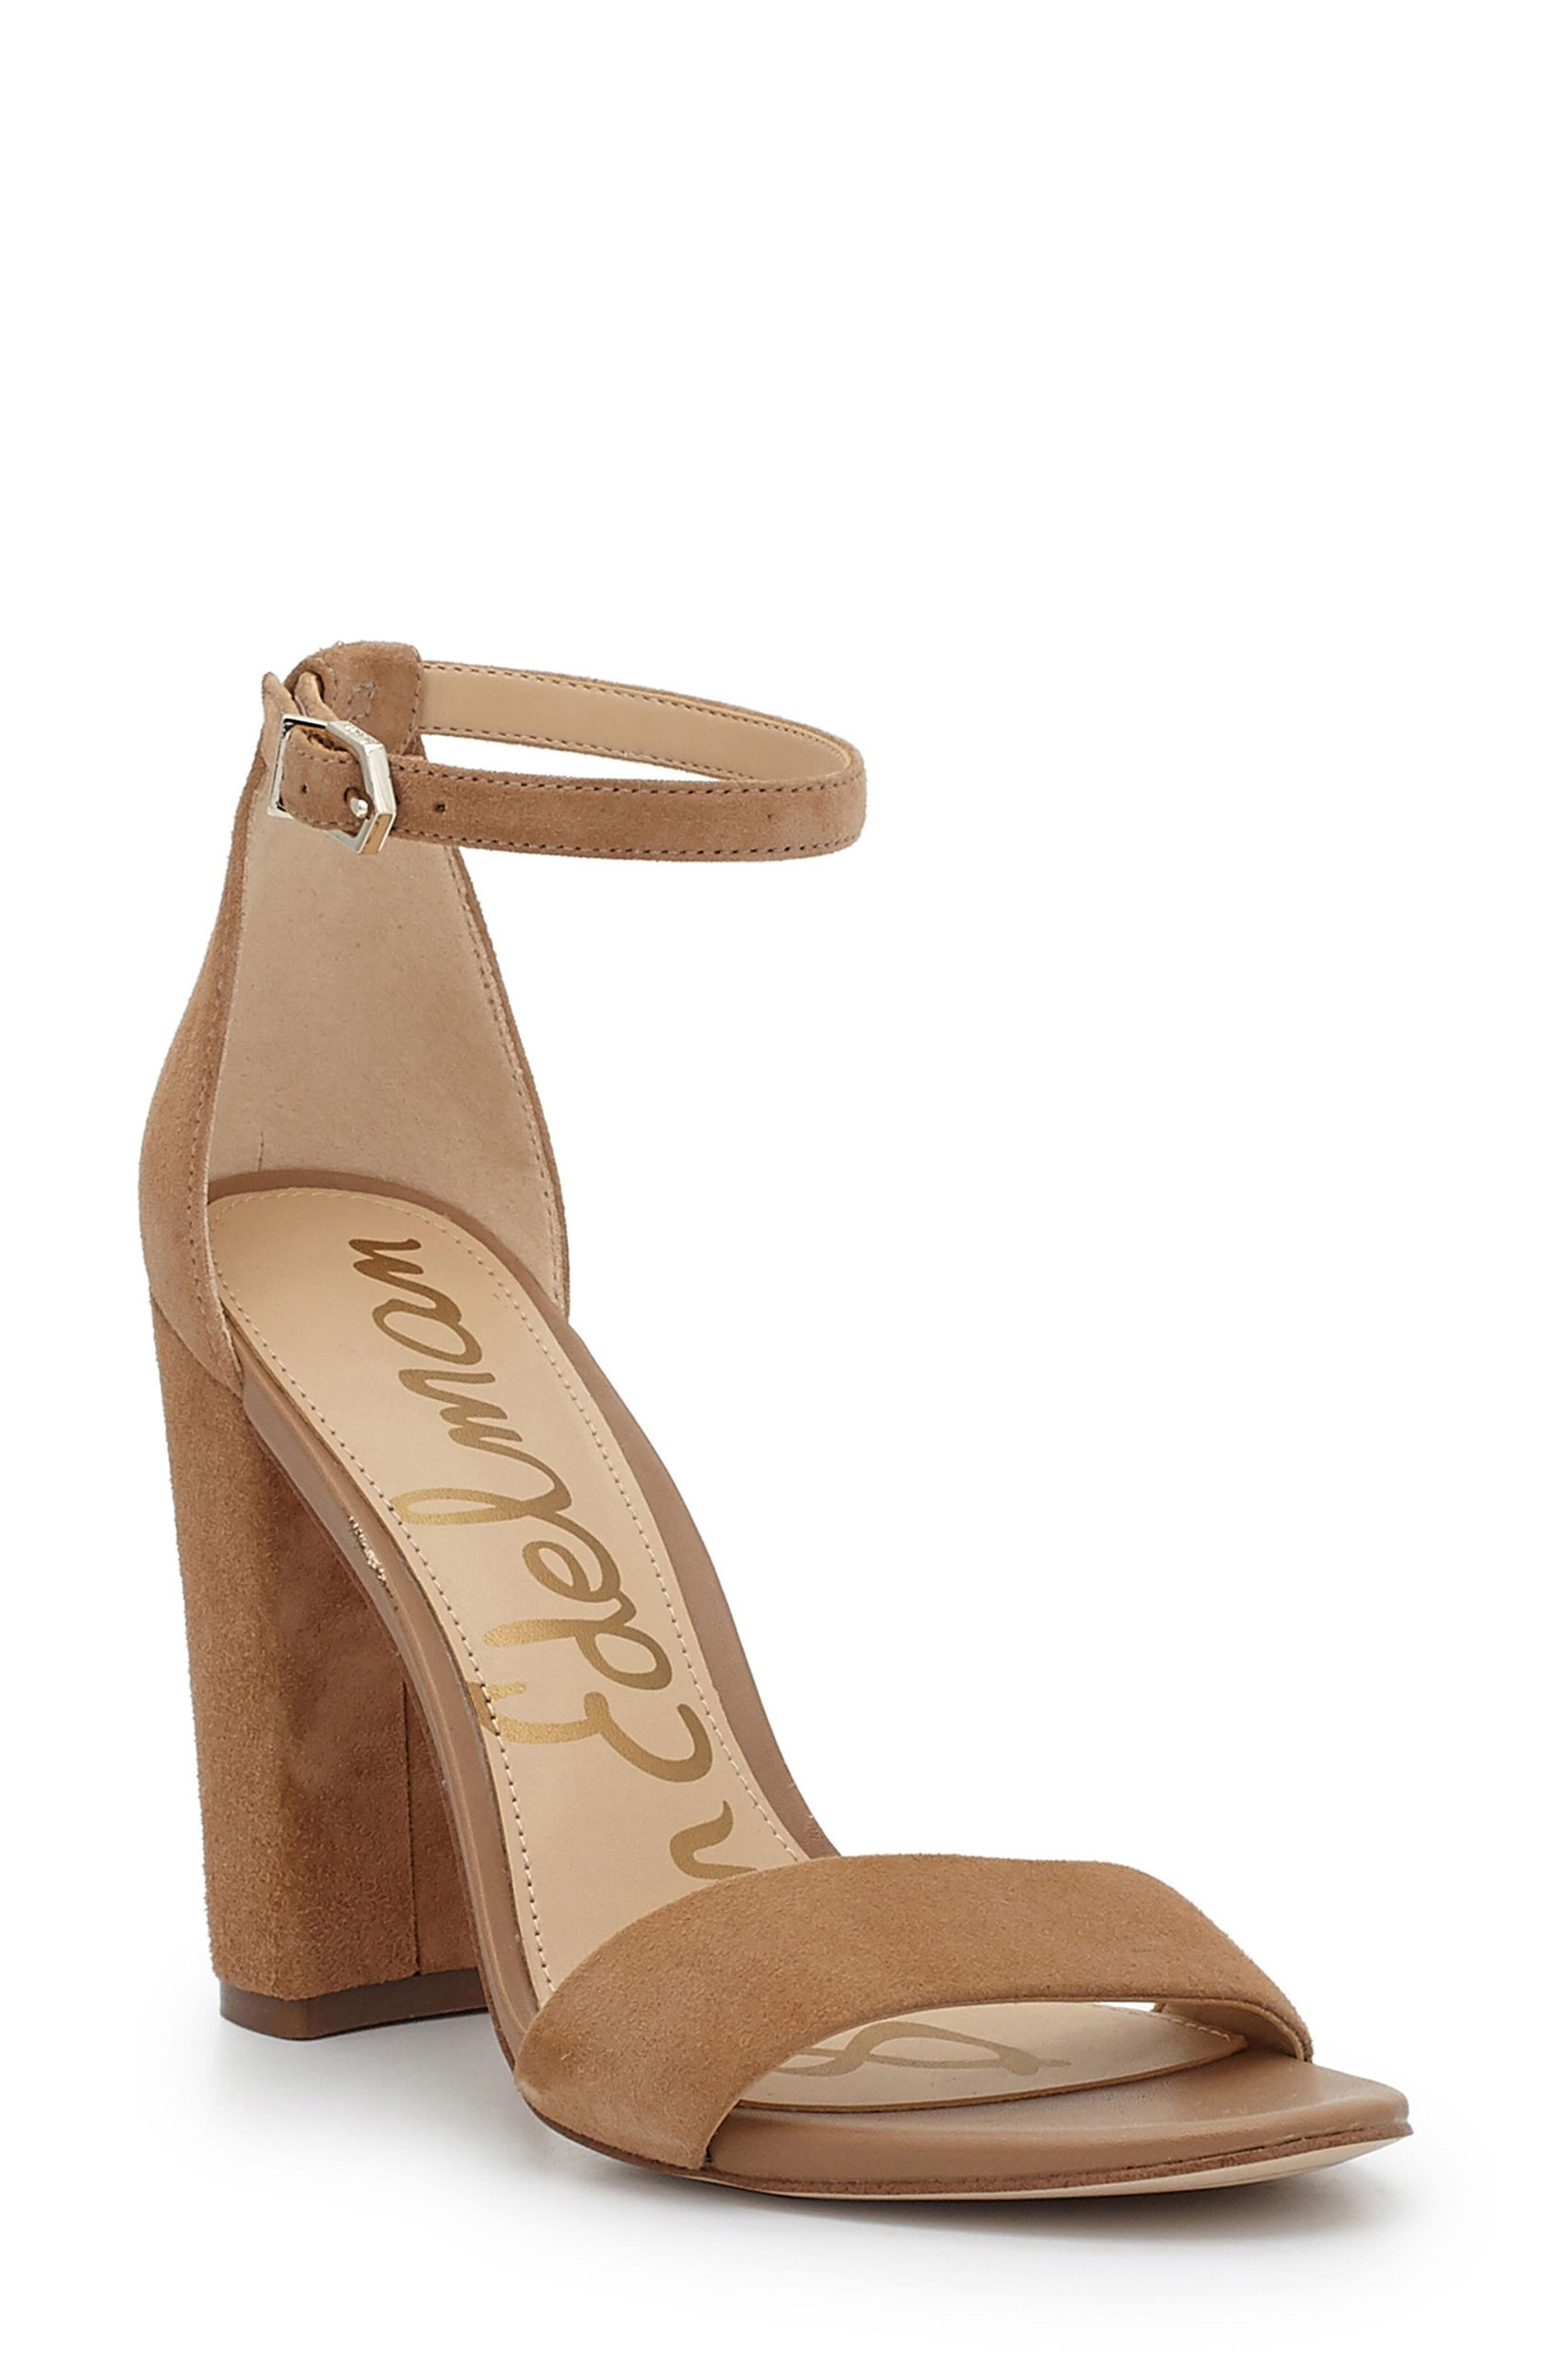 337038e311e6 Sam Edelman Yaro Ankle Strap Sandal In Golden Caramel Suede